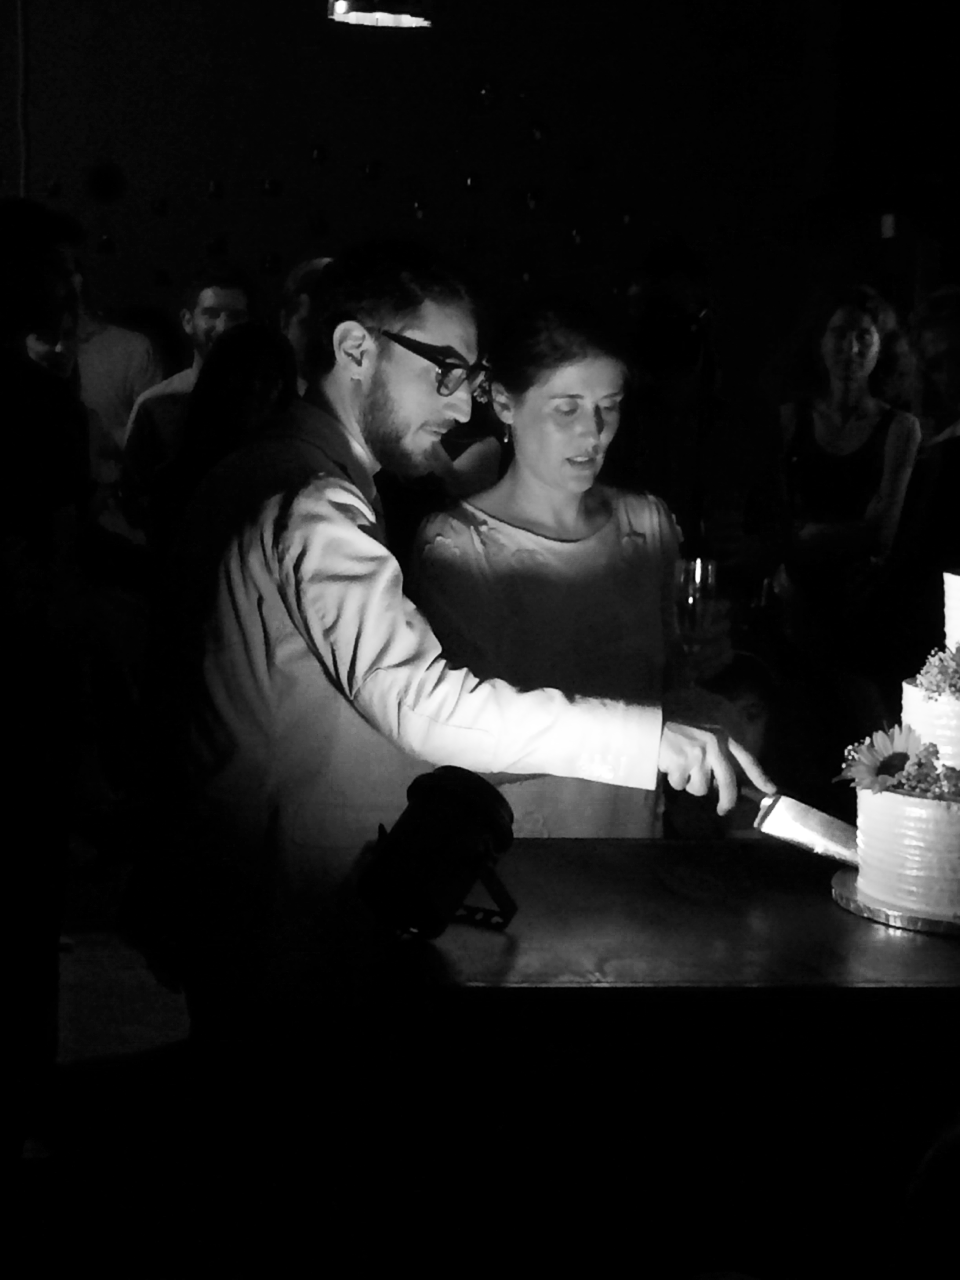 Adam & Amelie's wedding - Greenpoint, BK - 9.14.14